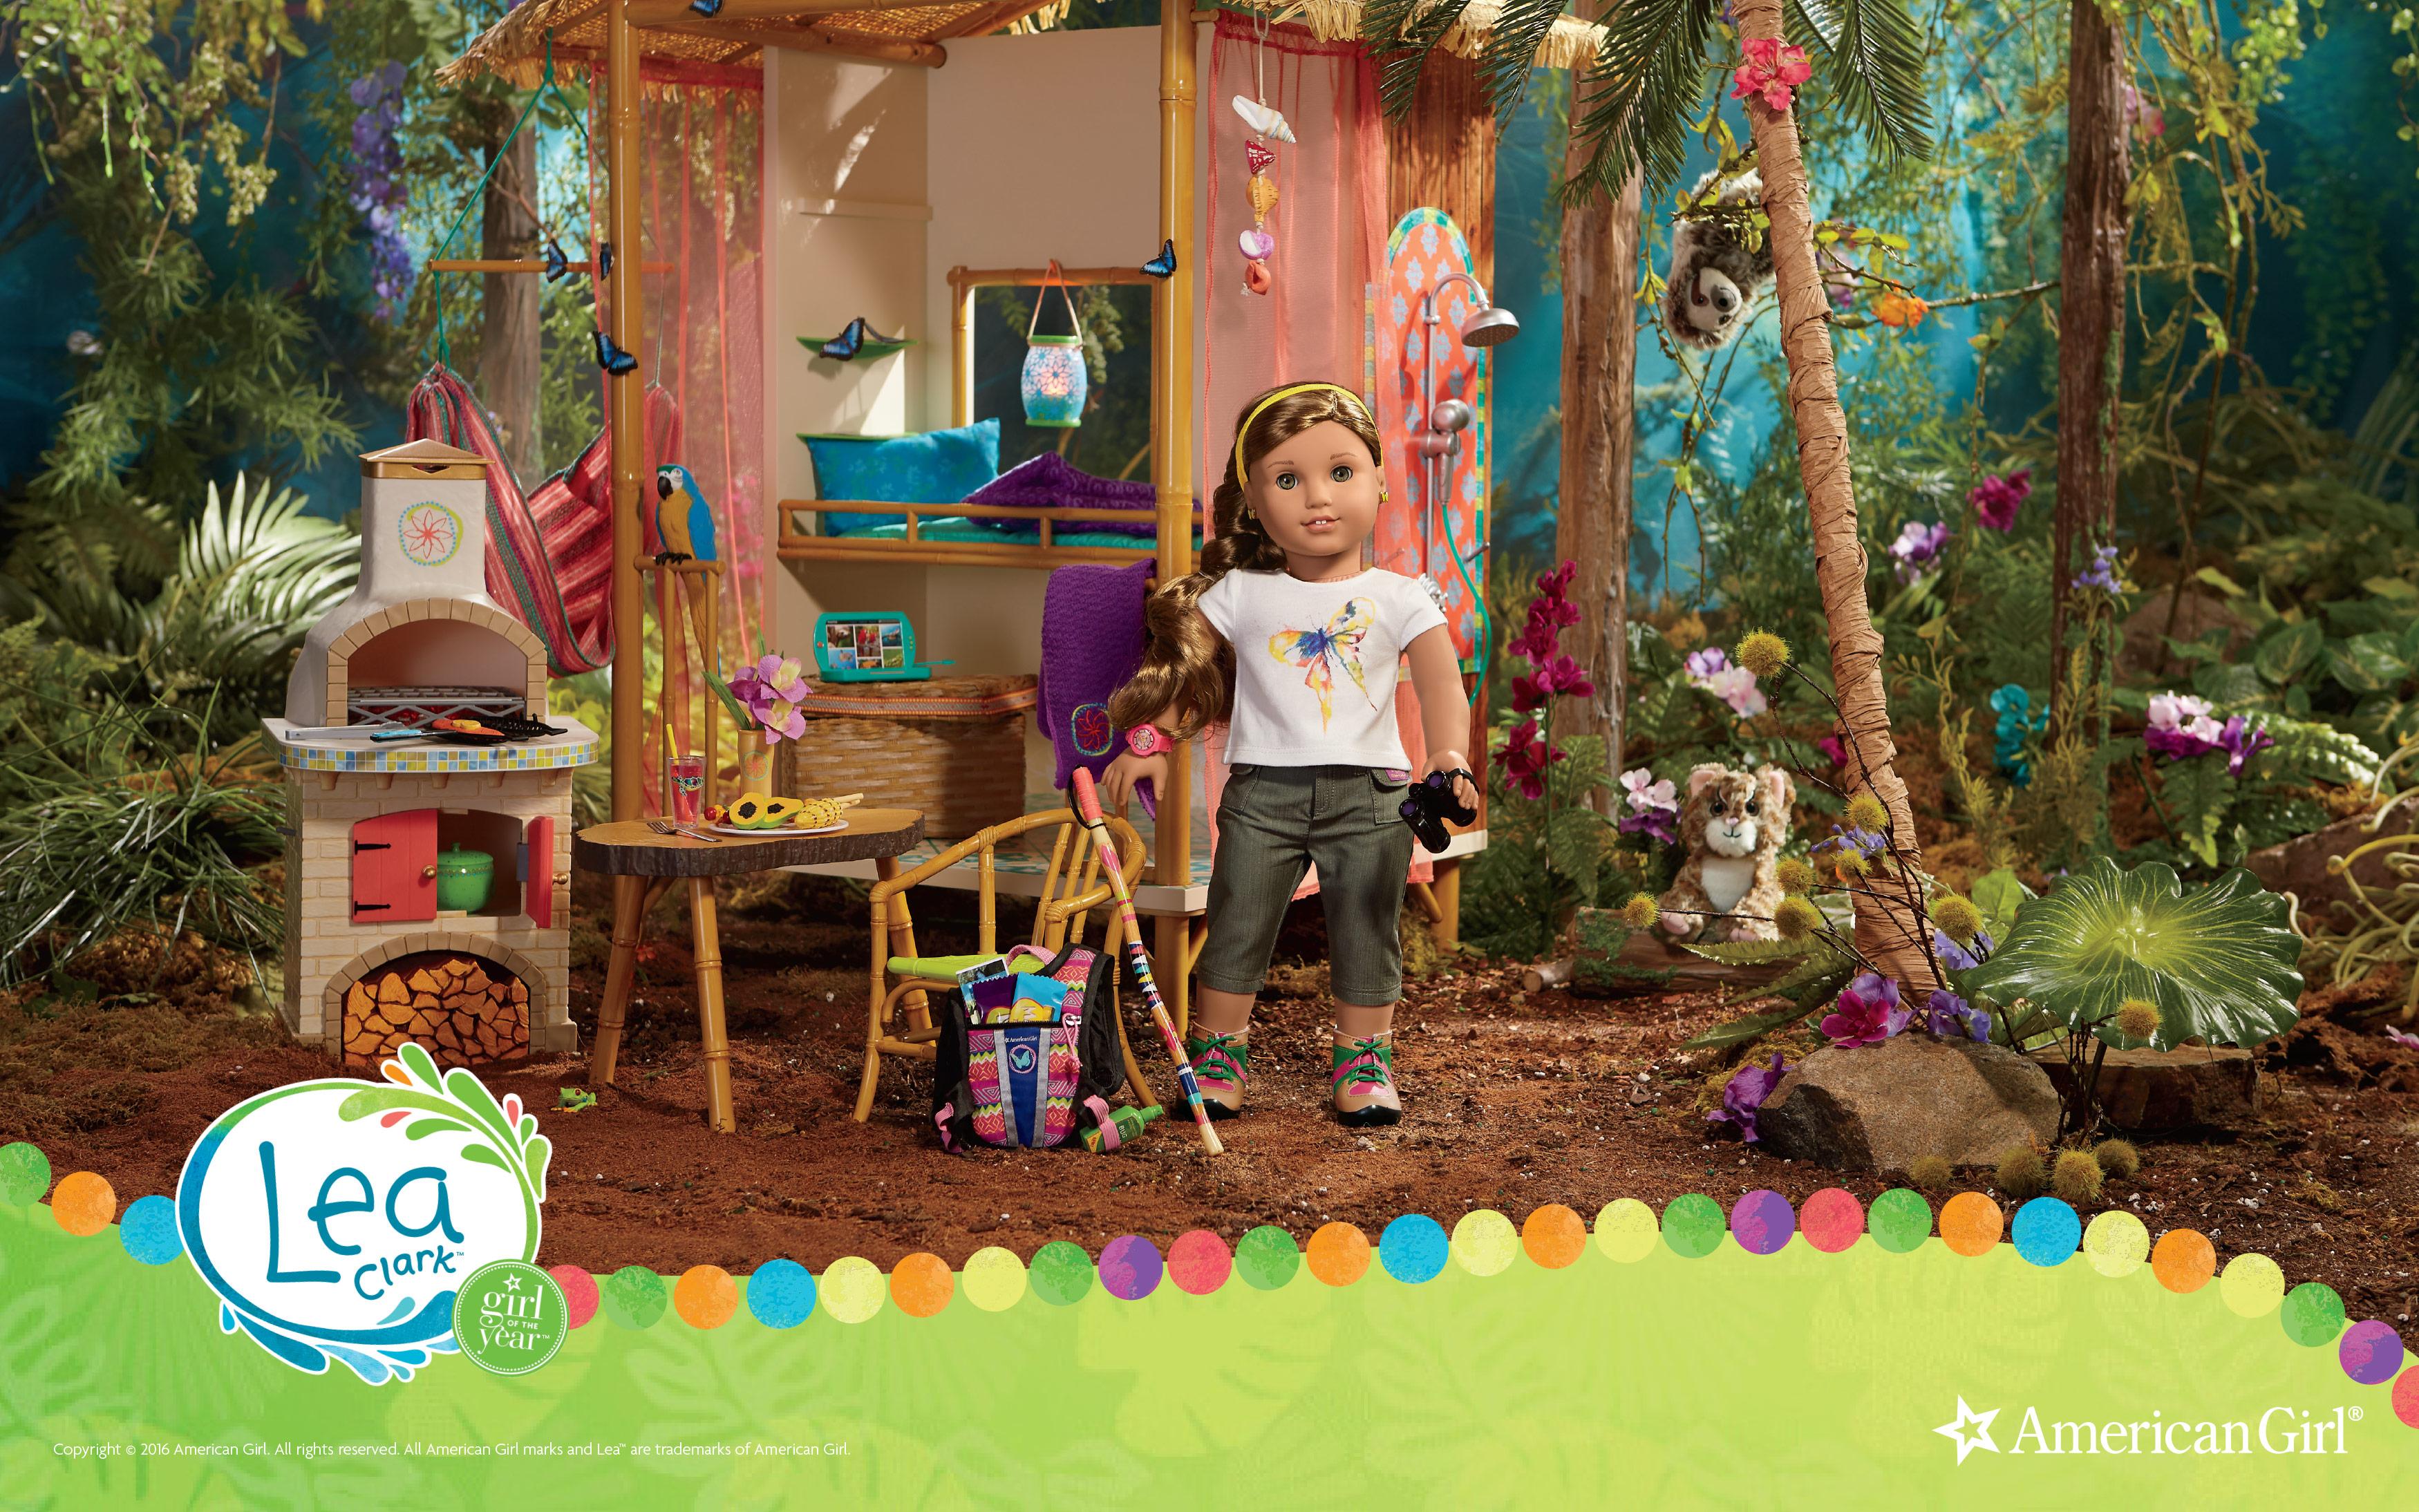 american girl doll wallpaper  Lea Clark   2016   Girl of the Year   Play at American Girl